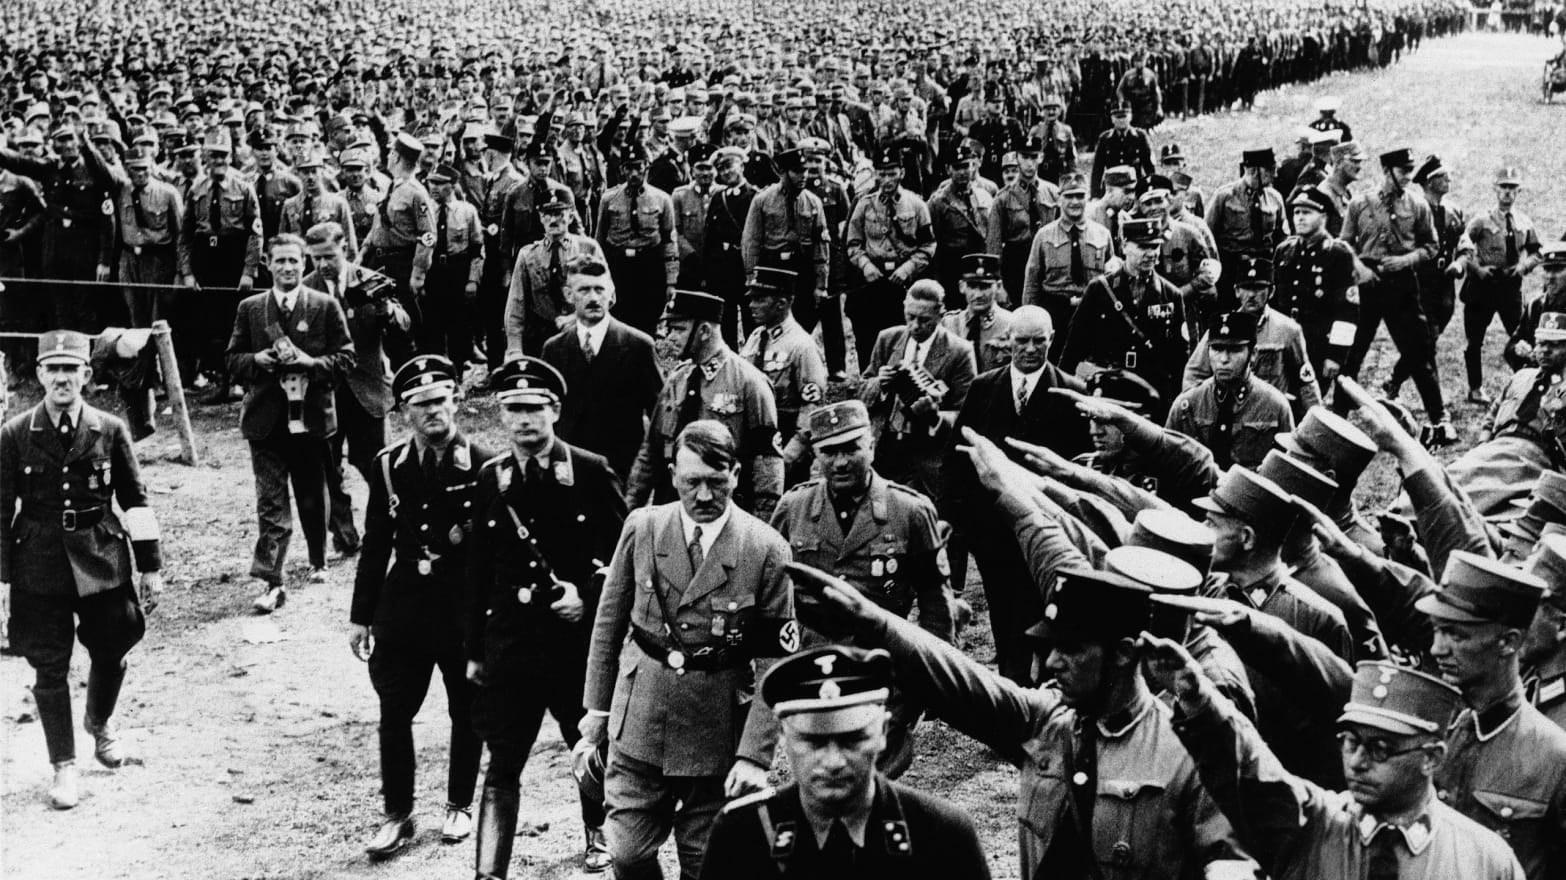 130508-Schillinger-Nazis-tease_qa3epn.jpeg